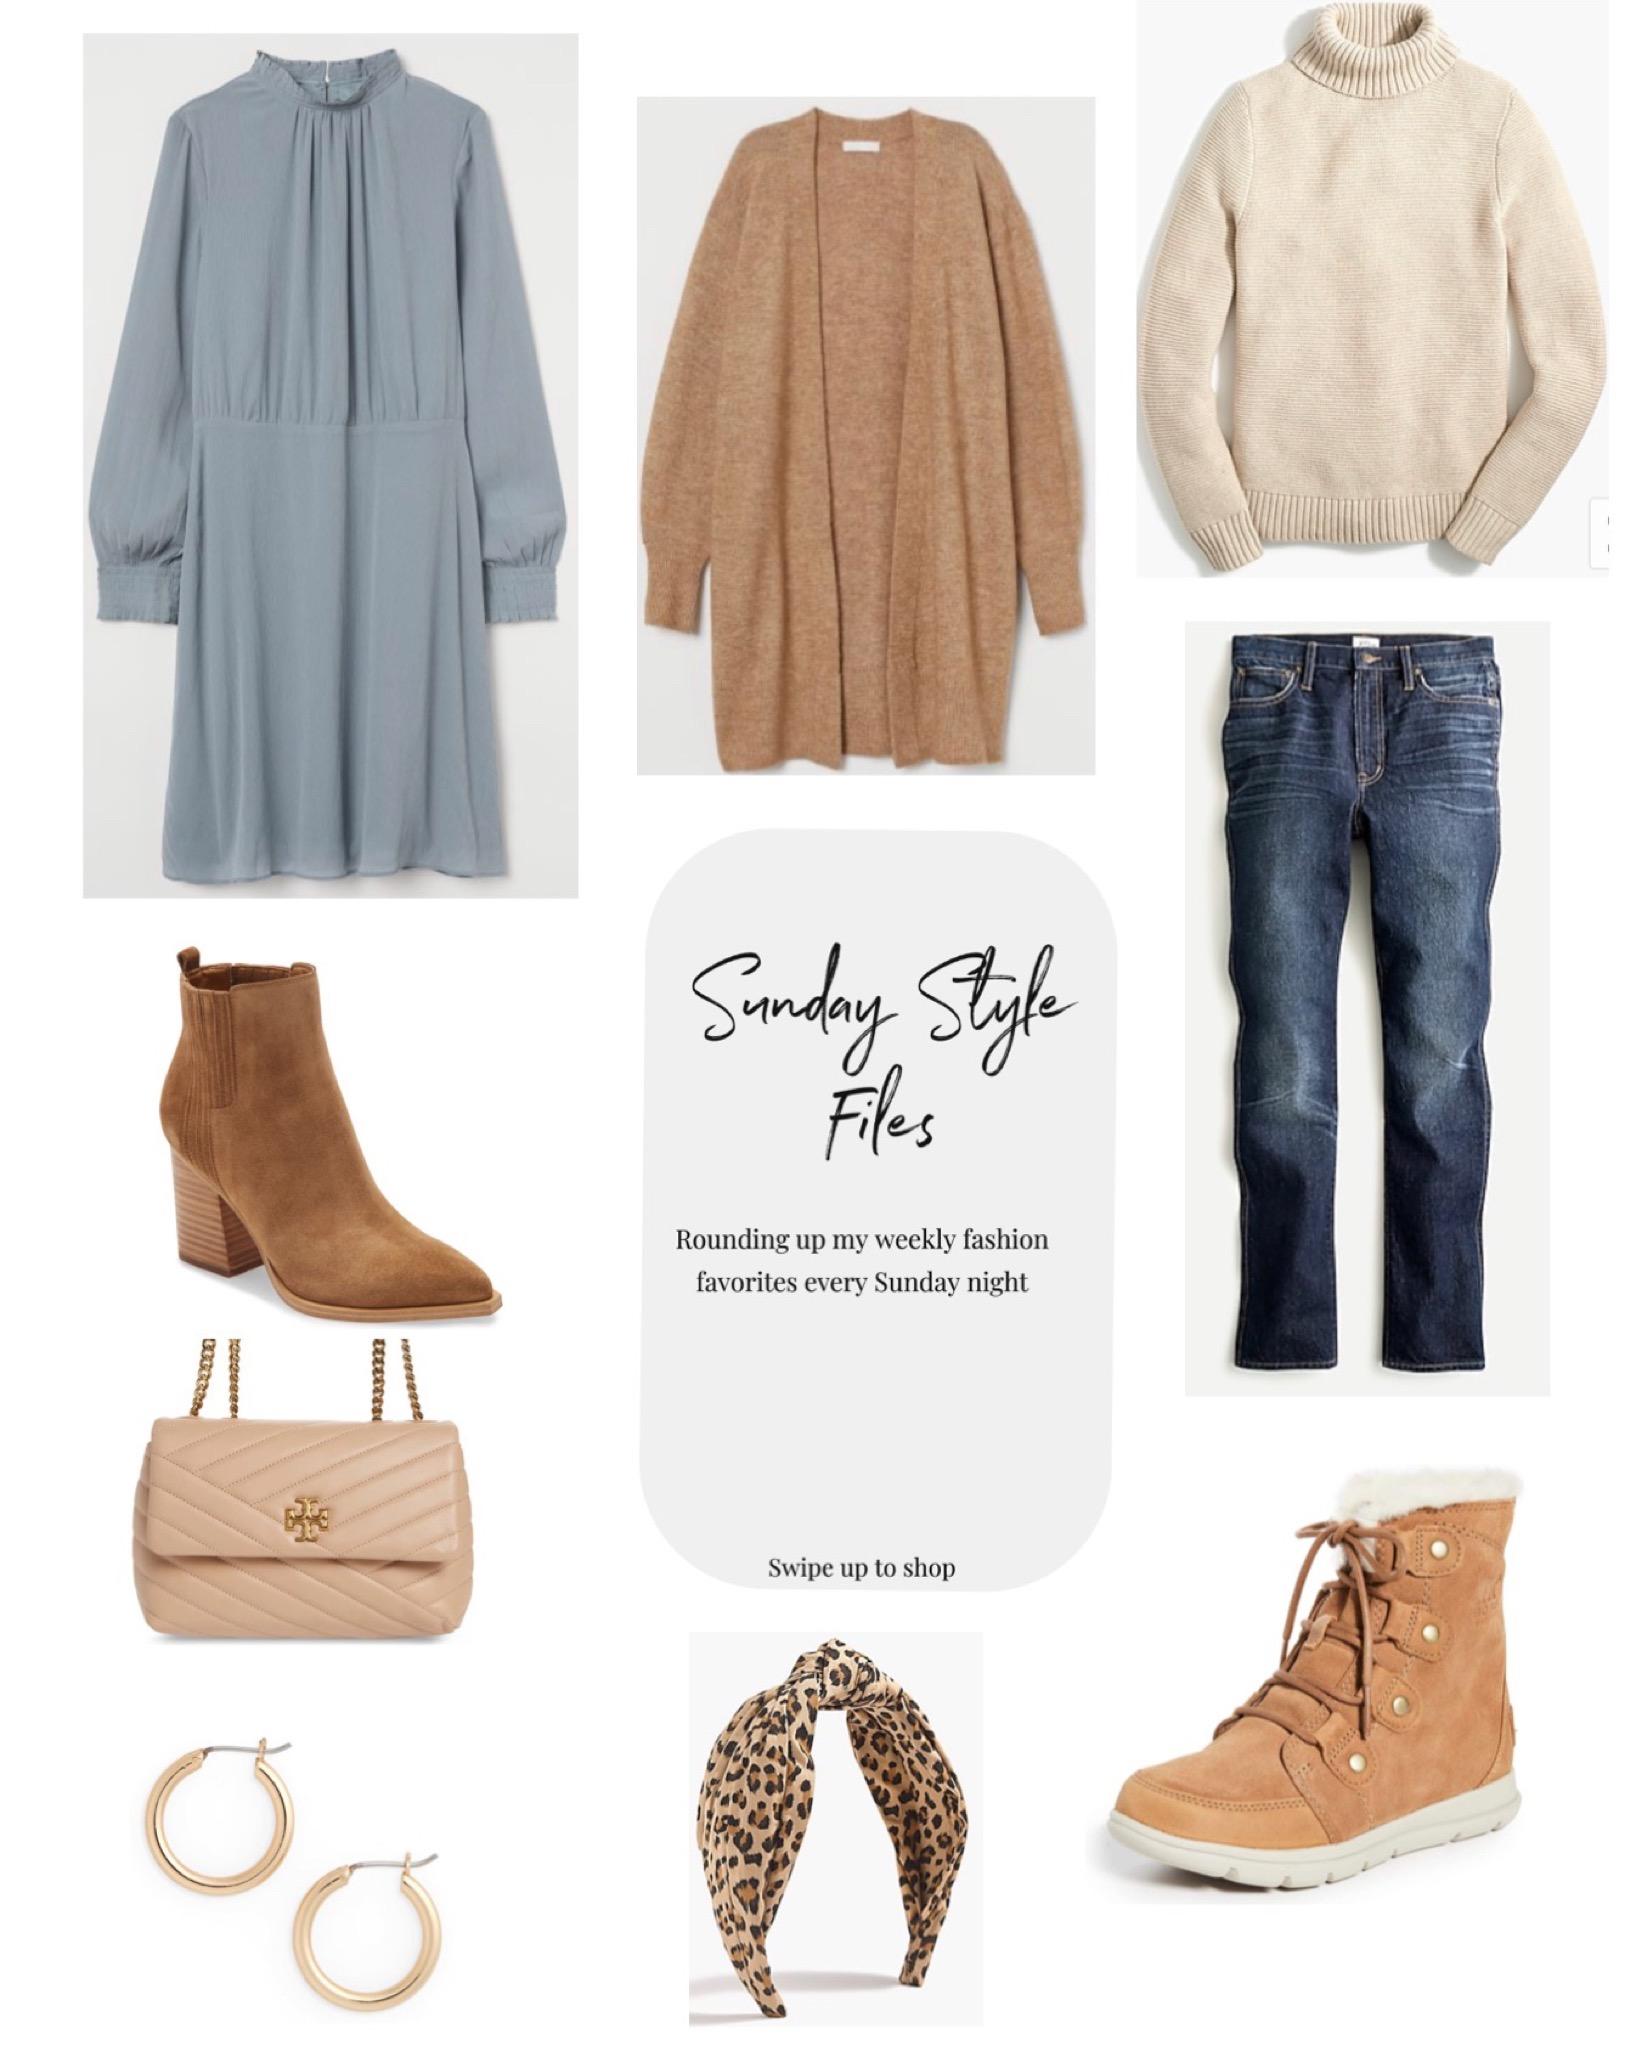 Sunday Style Files